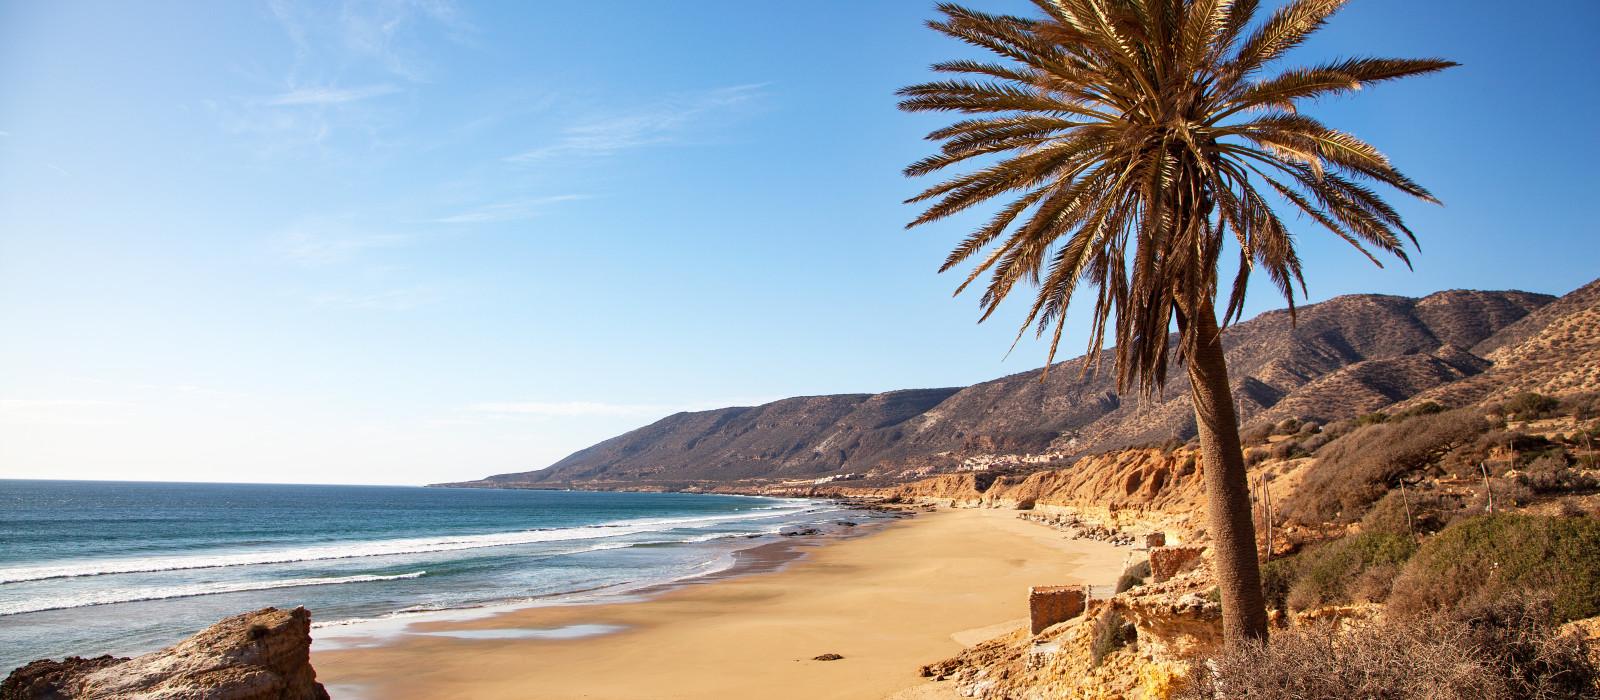 Southern Morocco and Coastal Gems Tour Trip 1